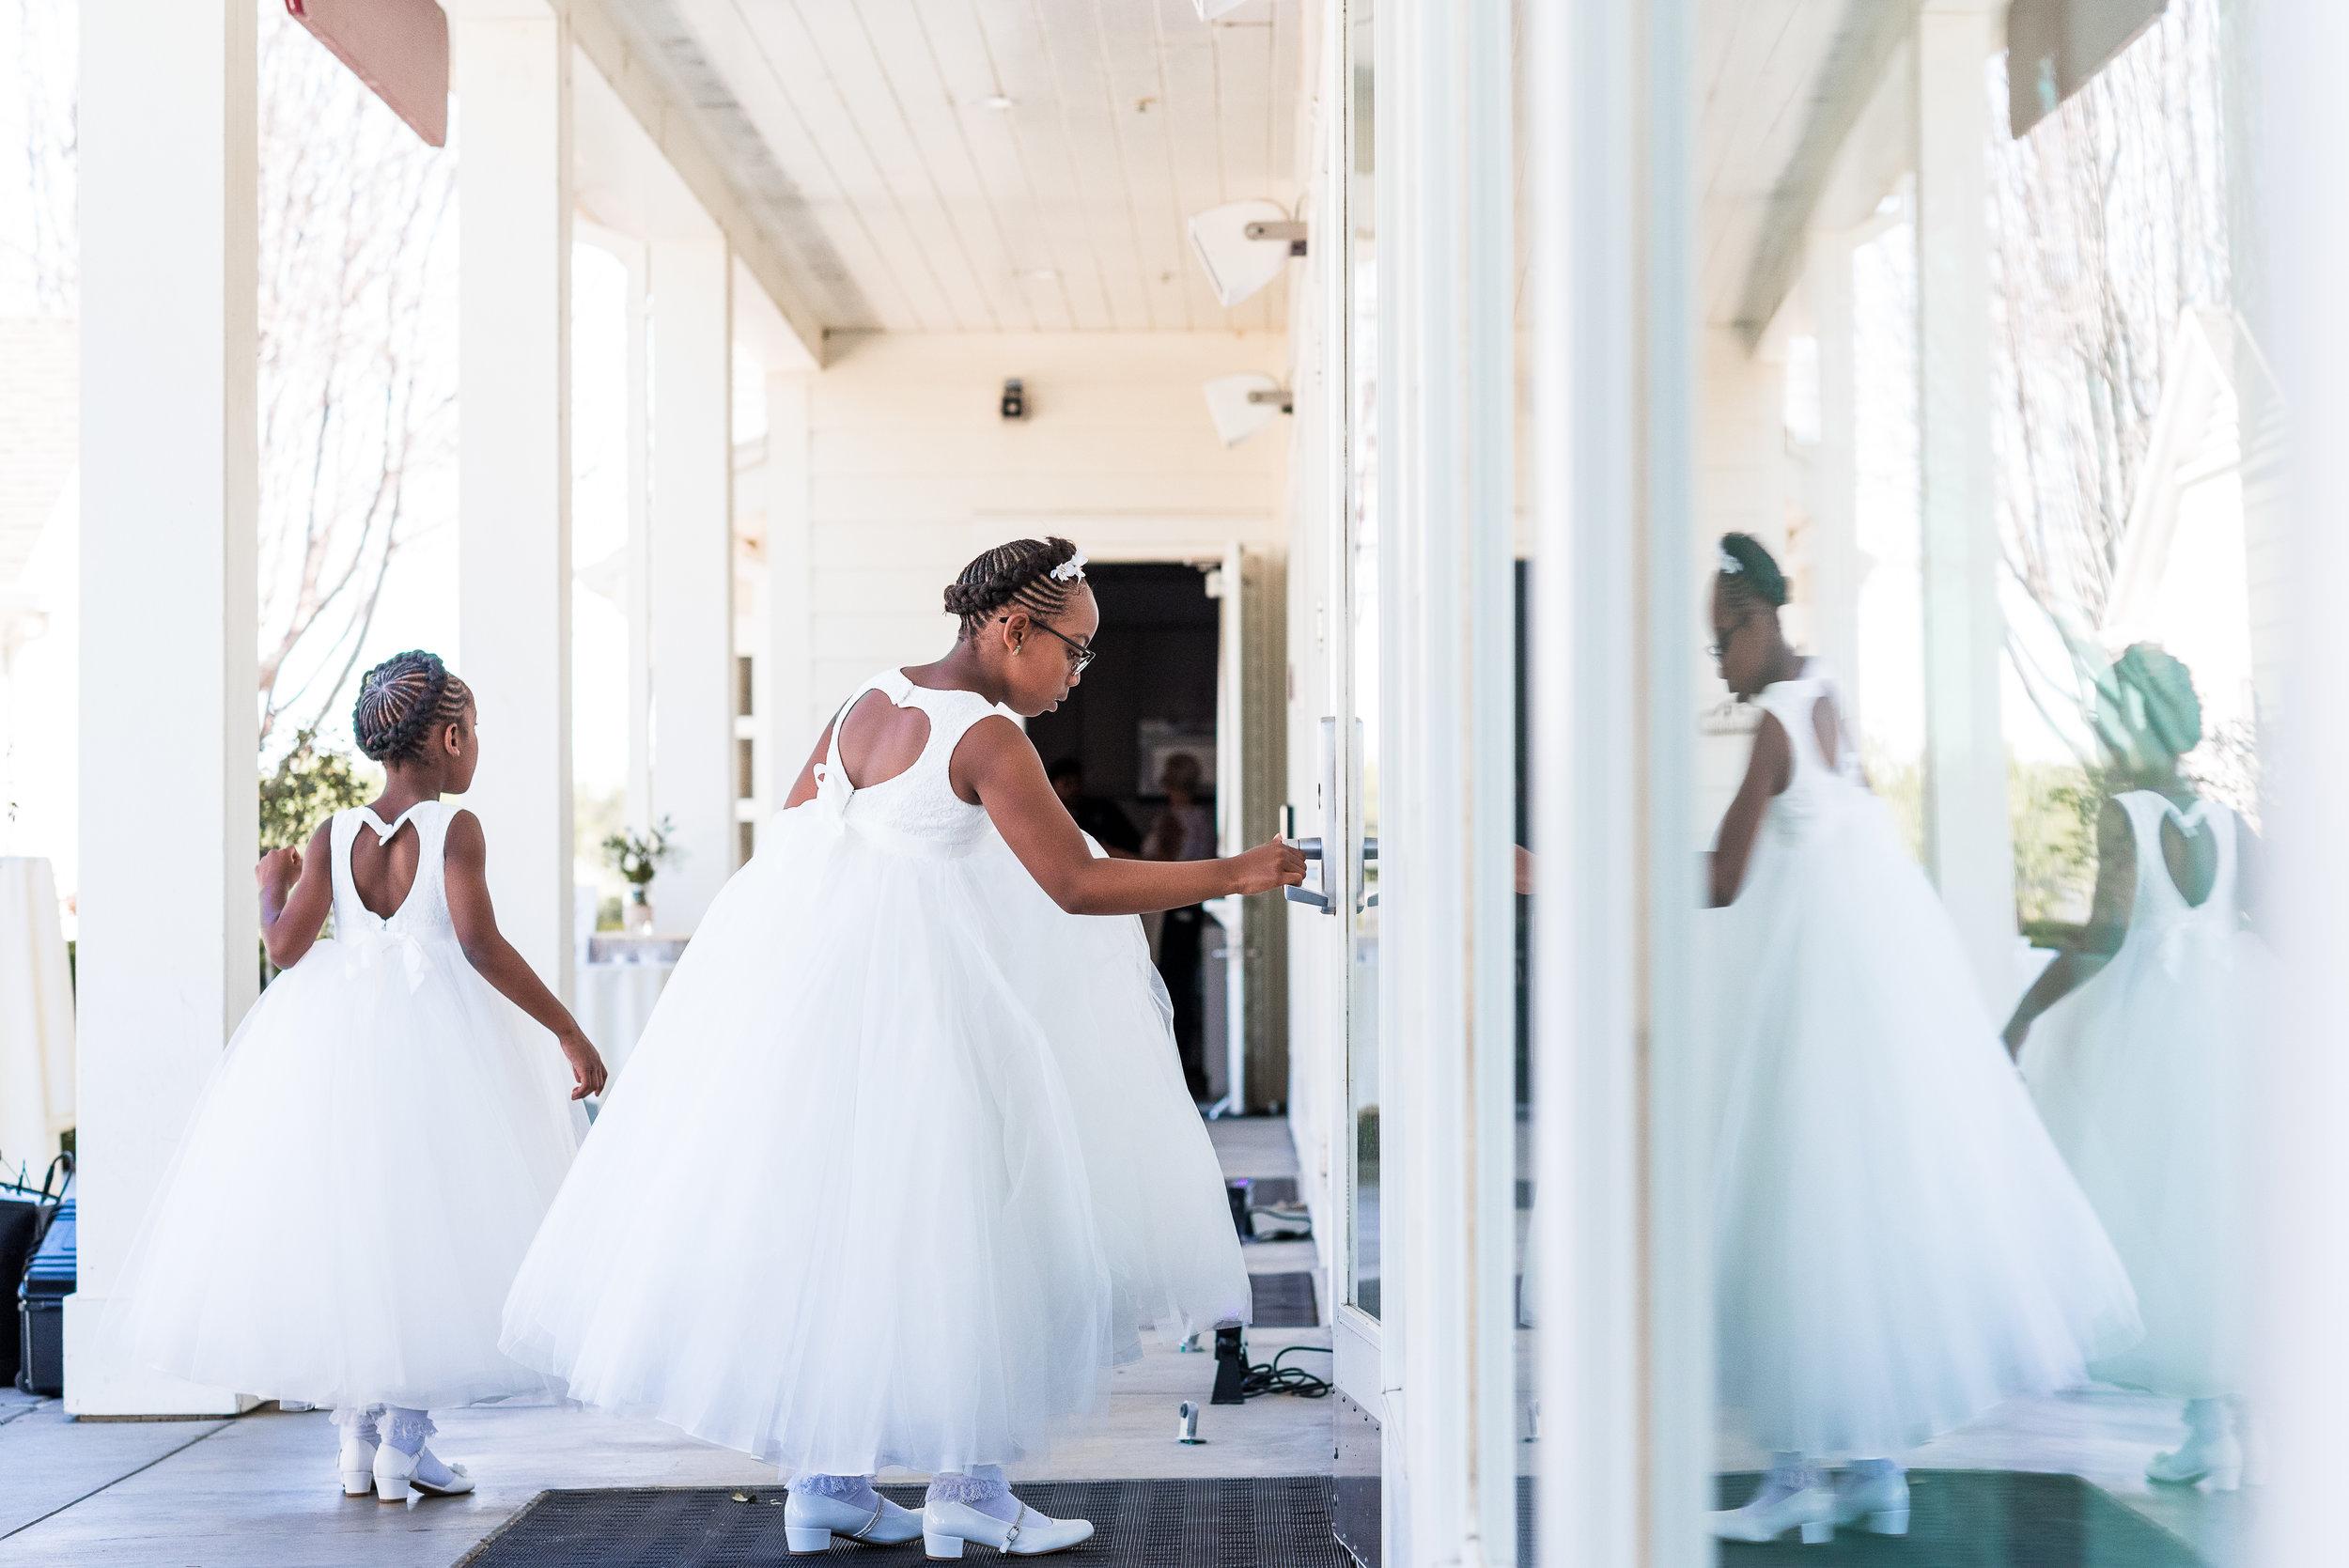 st-louis-wedding-photographer-moreno-valley-wedding-309.jpg